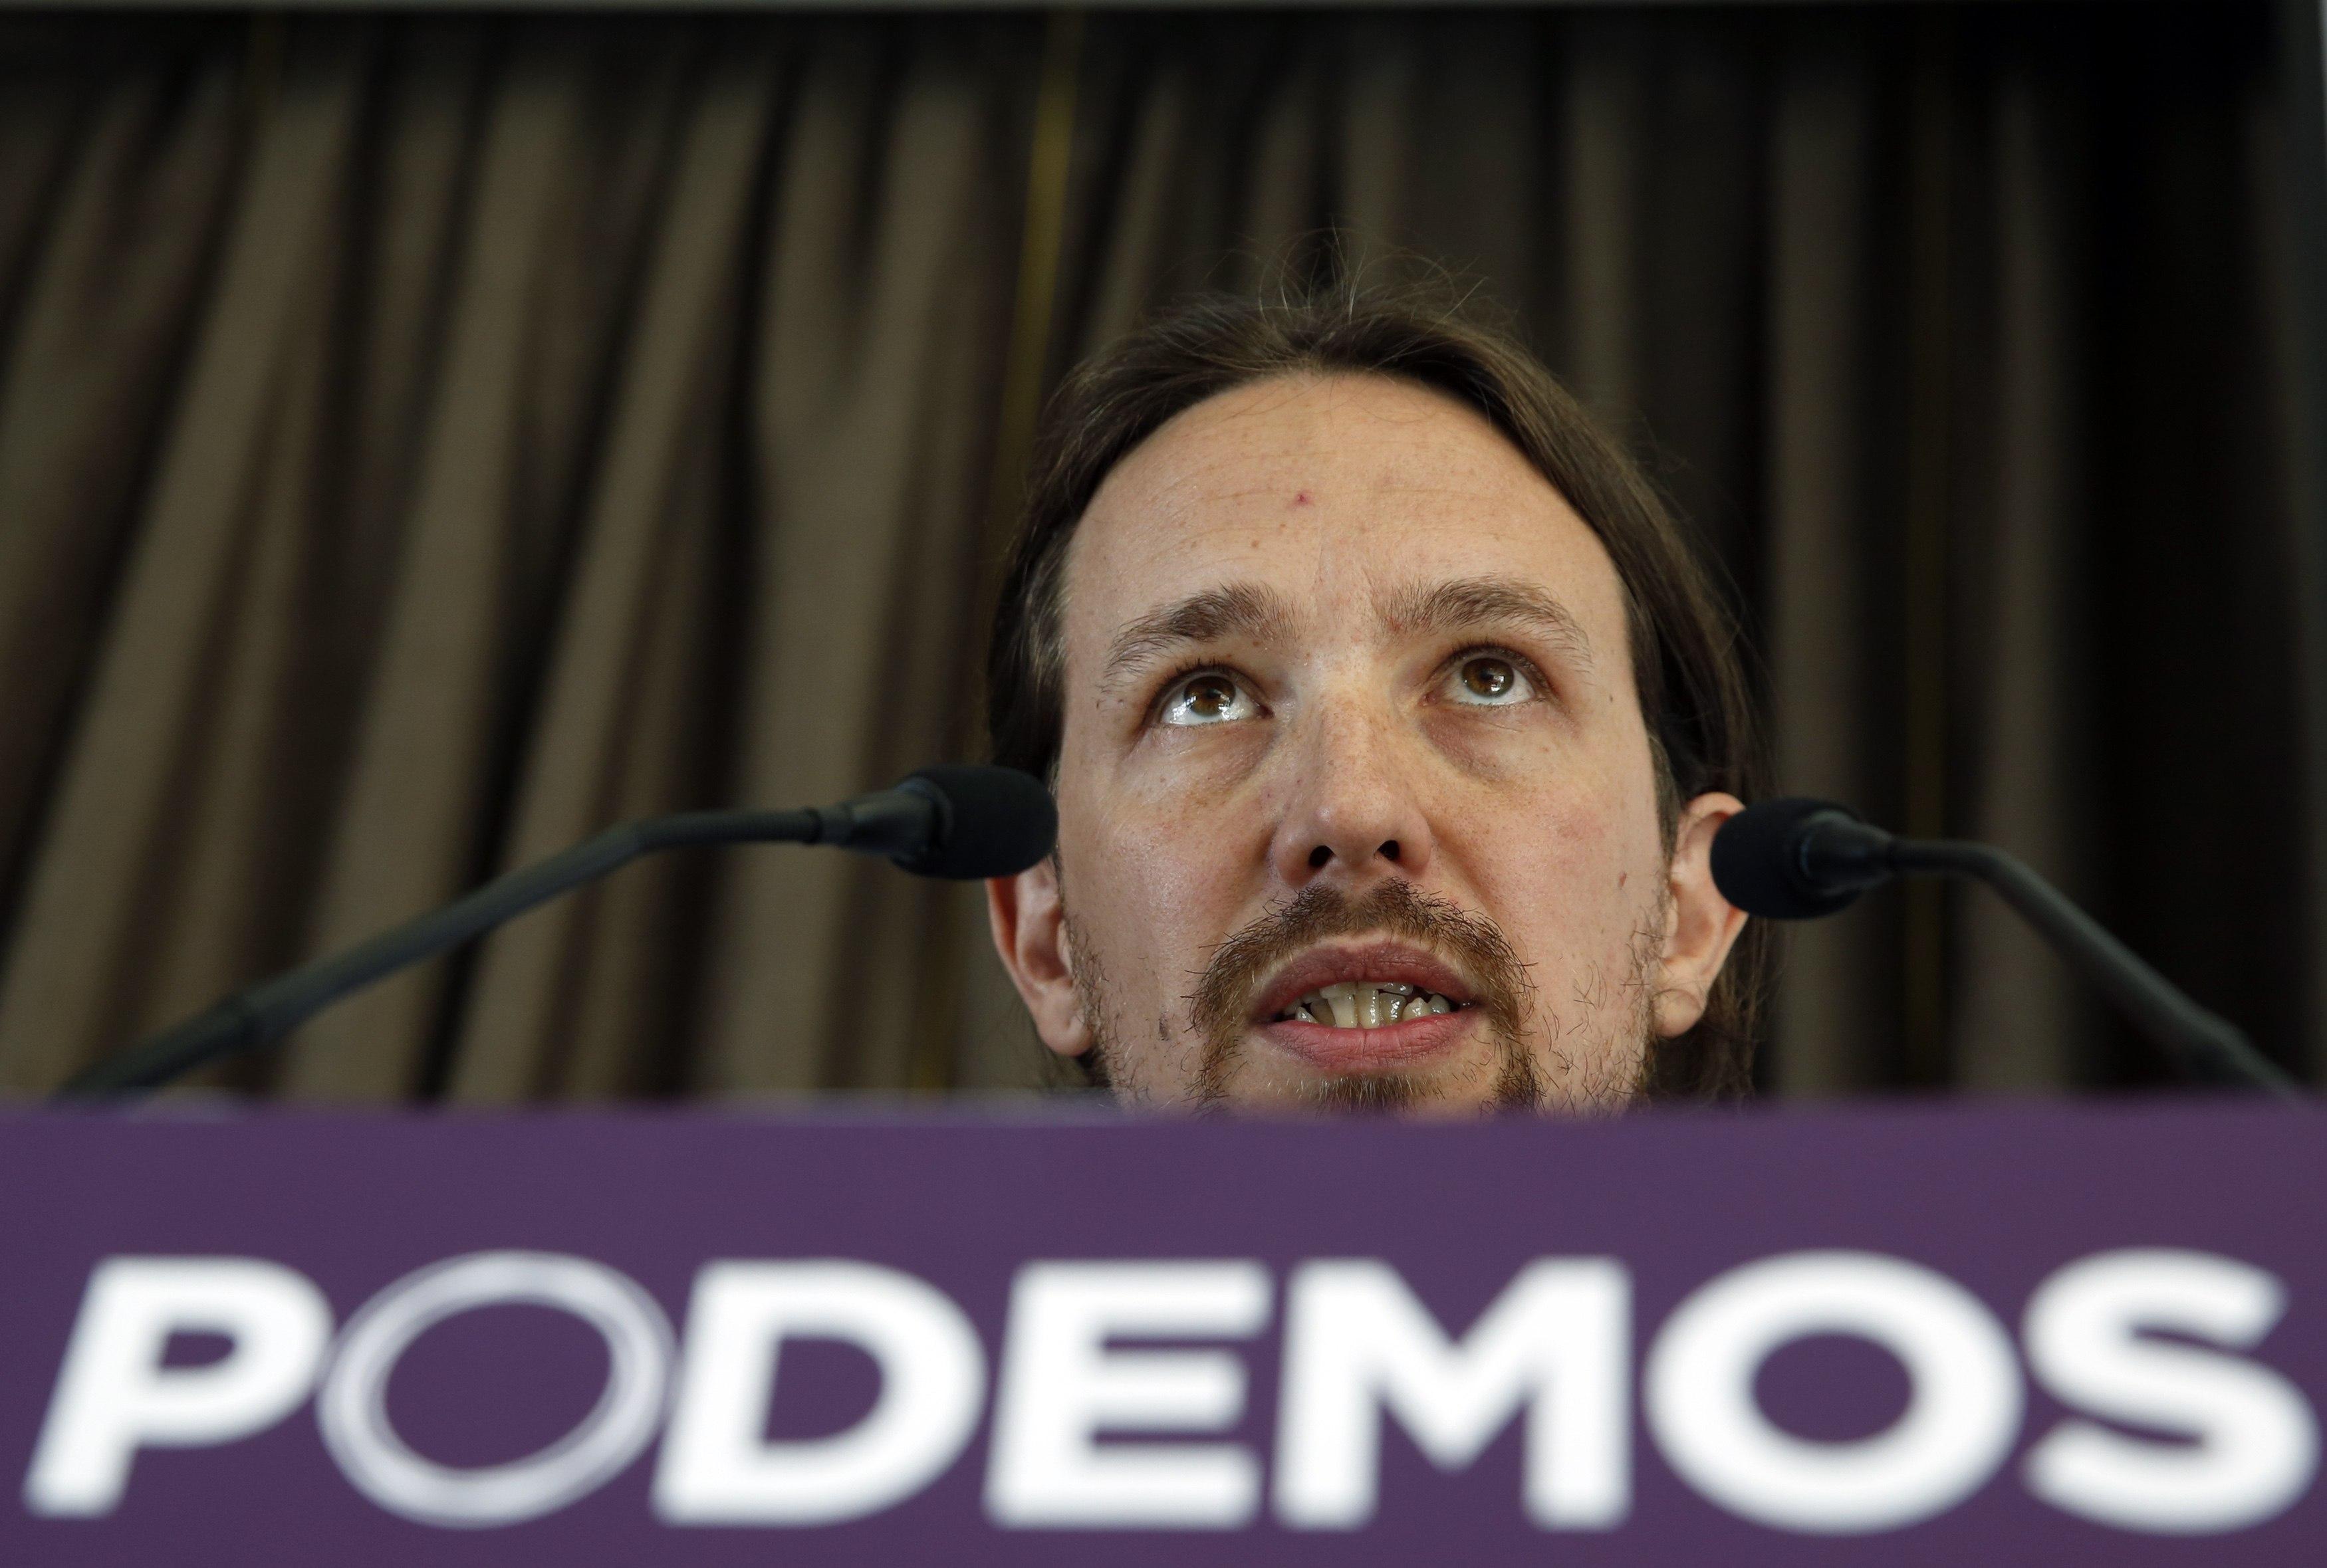 WSJ: Πιθανόν να χρειαστεί «θυσία» της Ελλάδας για να σωθεί η Ισπανία | tovima.gr